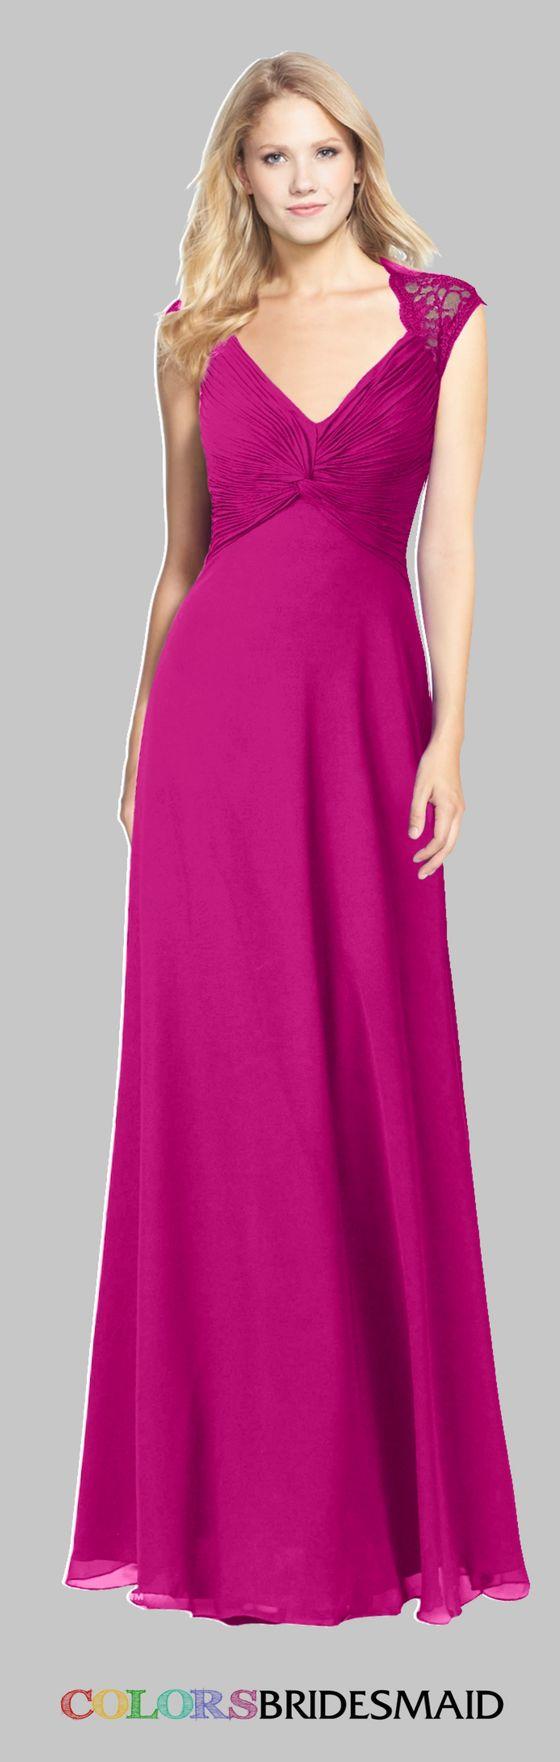 Único Oscuros Vestidos De Dama De Color Púrpura Modelo - Ideas de ...